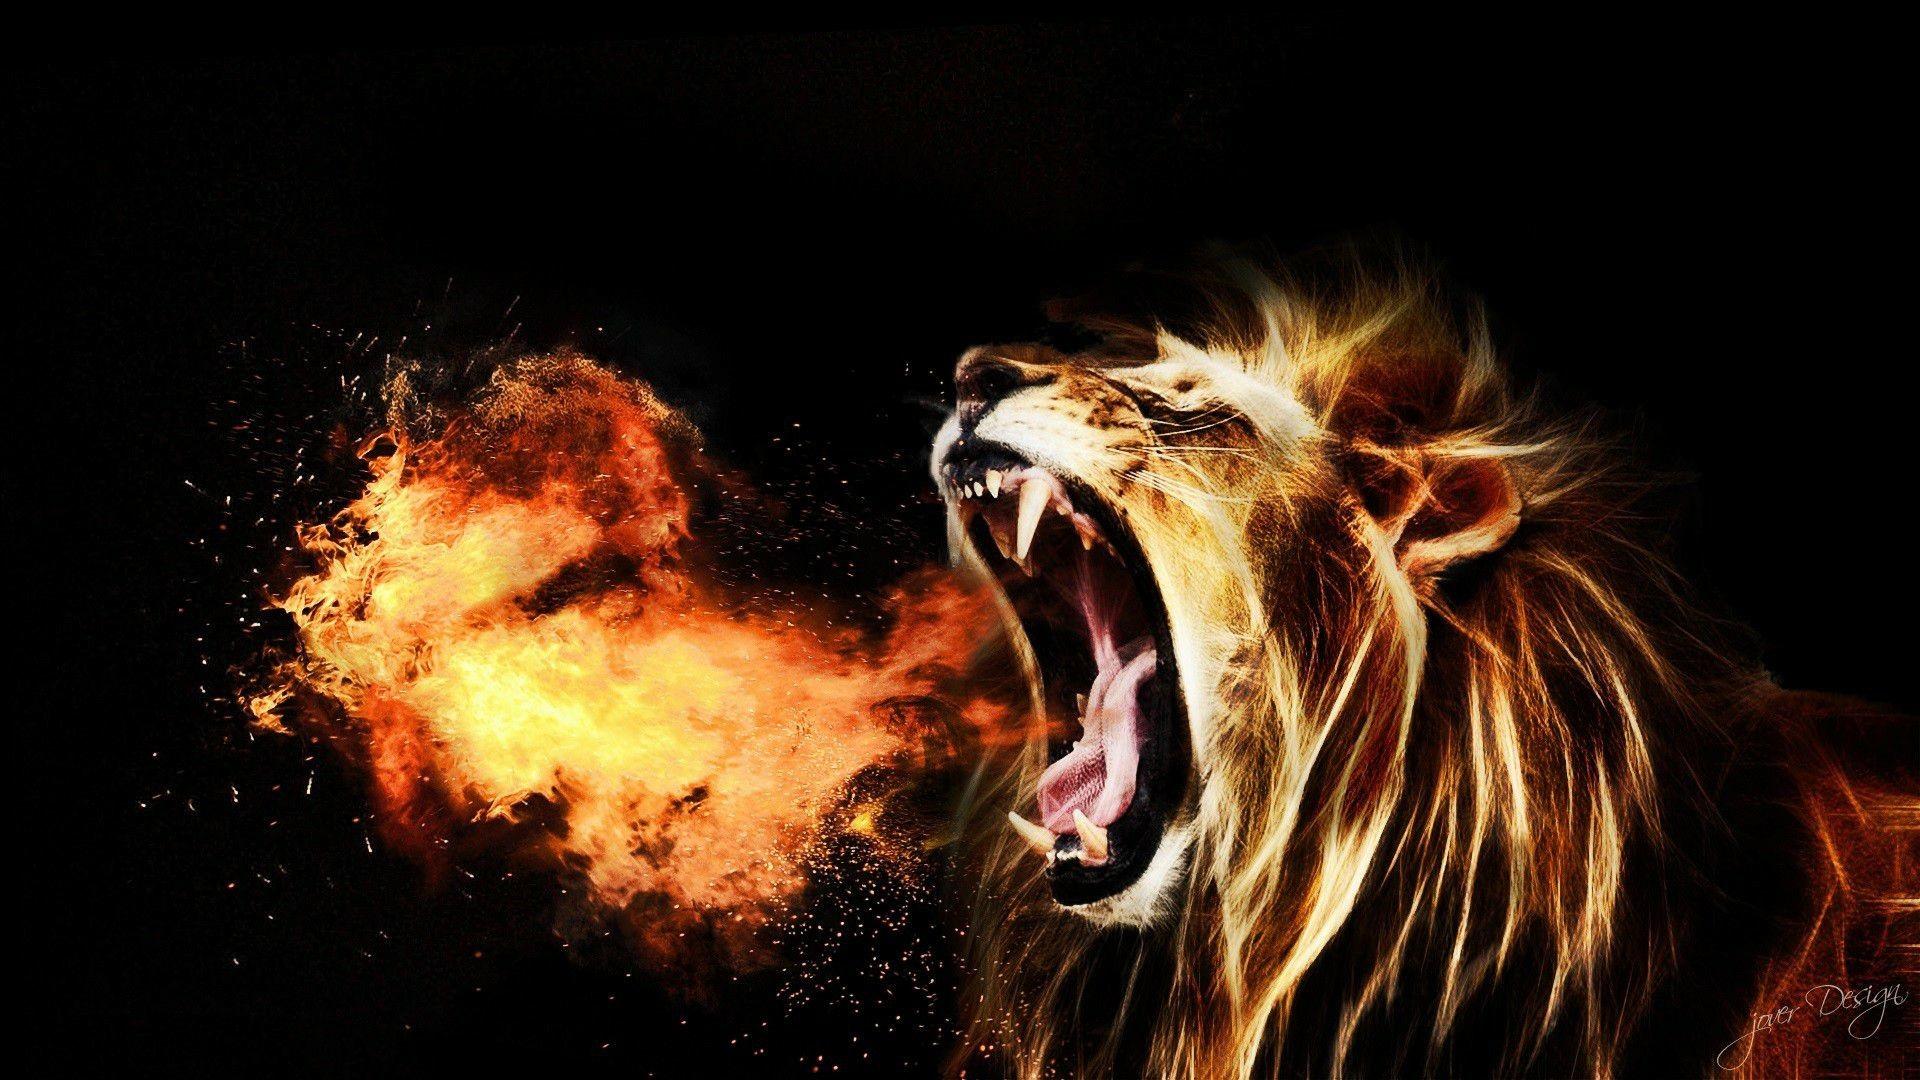 Best 25 Lion Hd Wallpaper Ideas On Pinterest: Roaring Lion Wallpaper (67+ Images